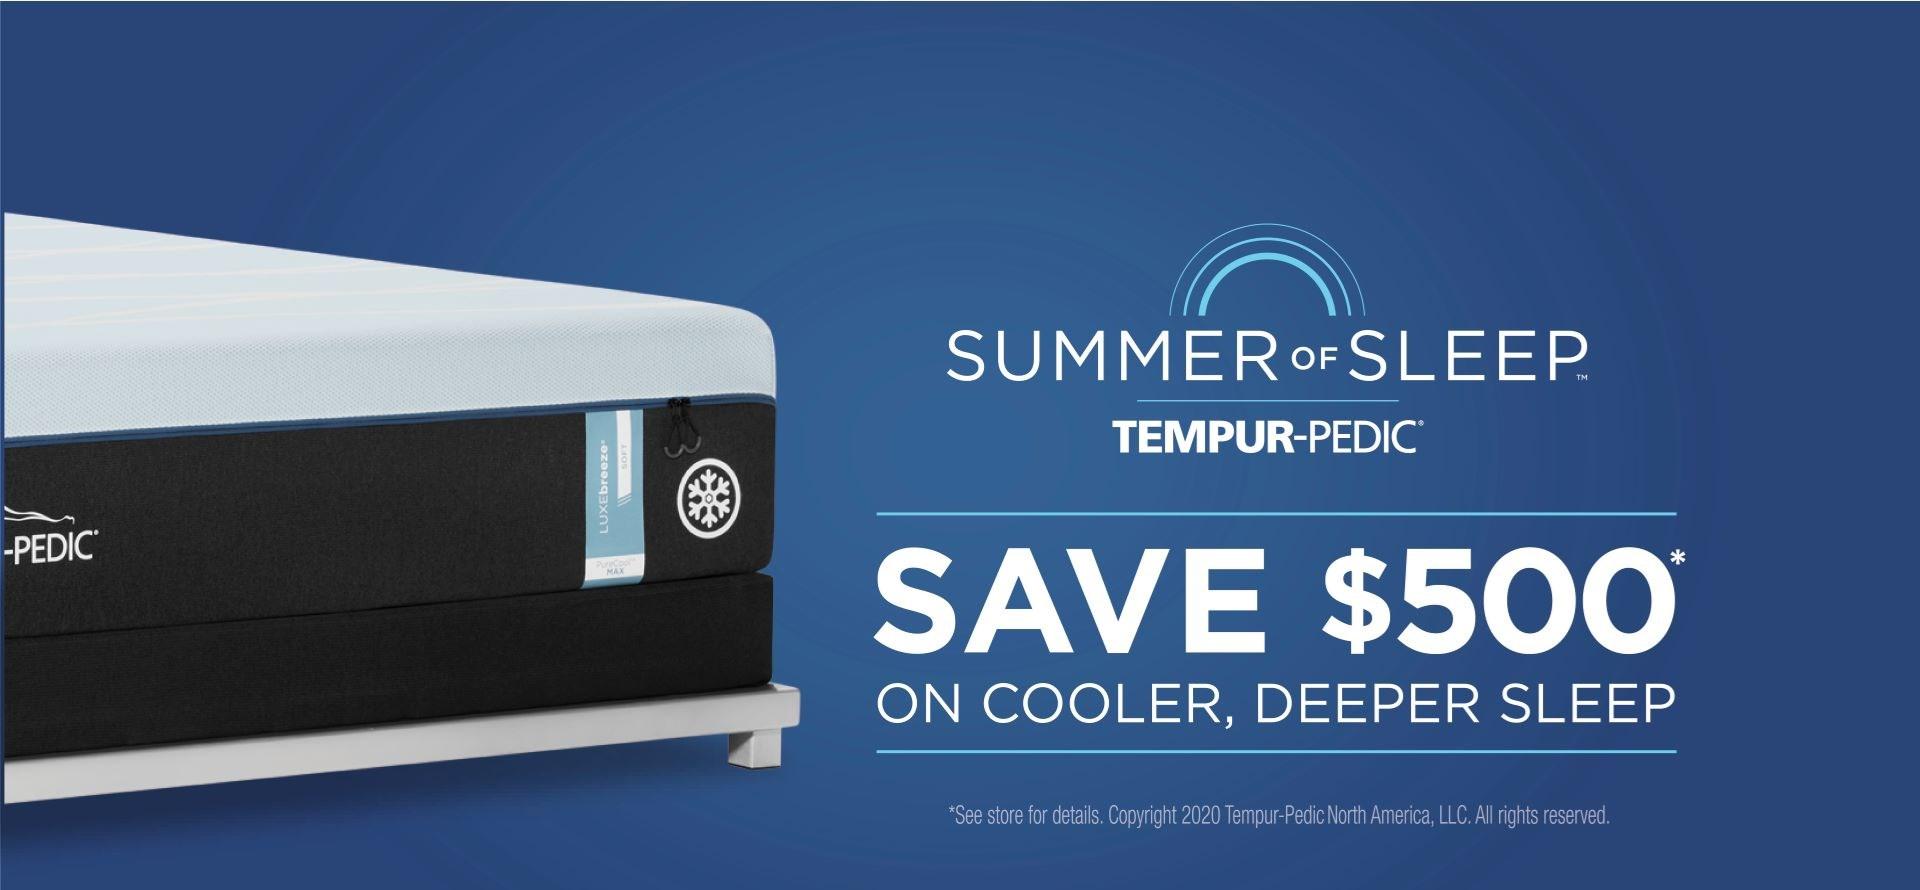 tempurpedic - save $500 on tempur-breeze mattresses